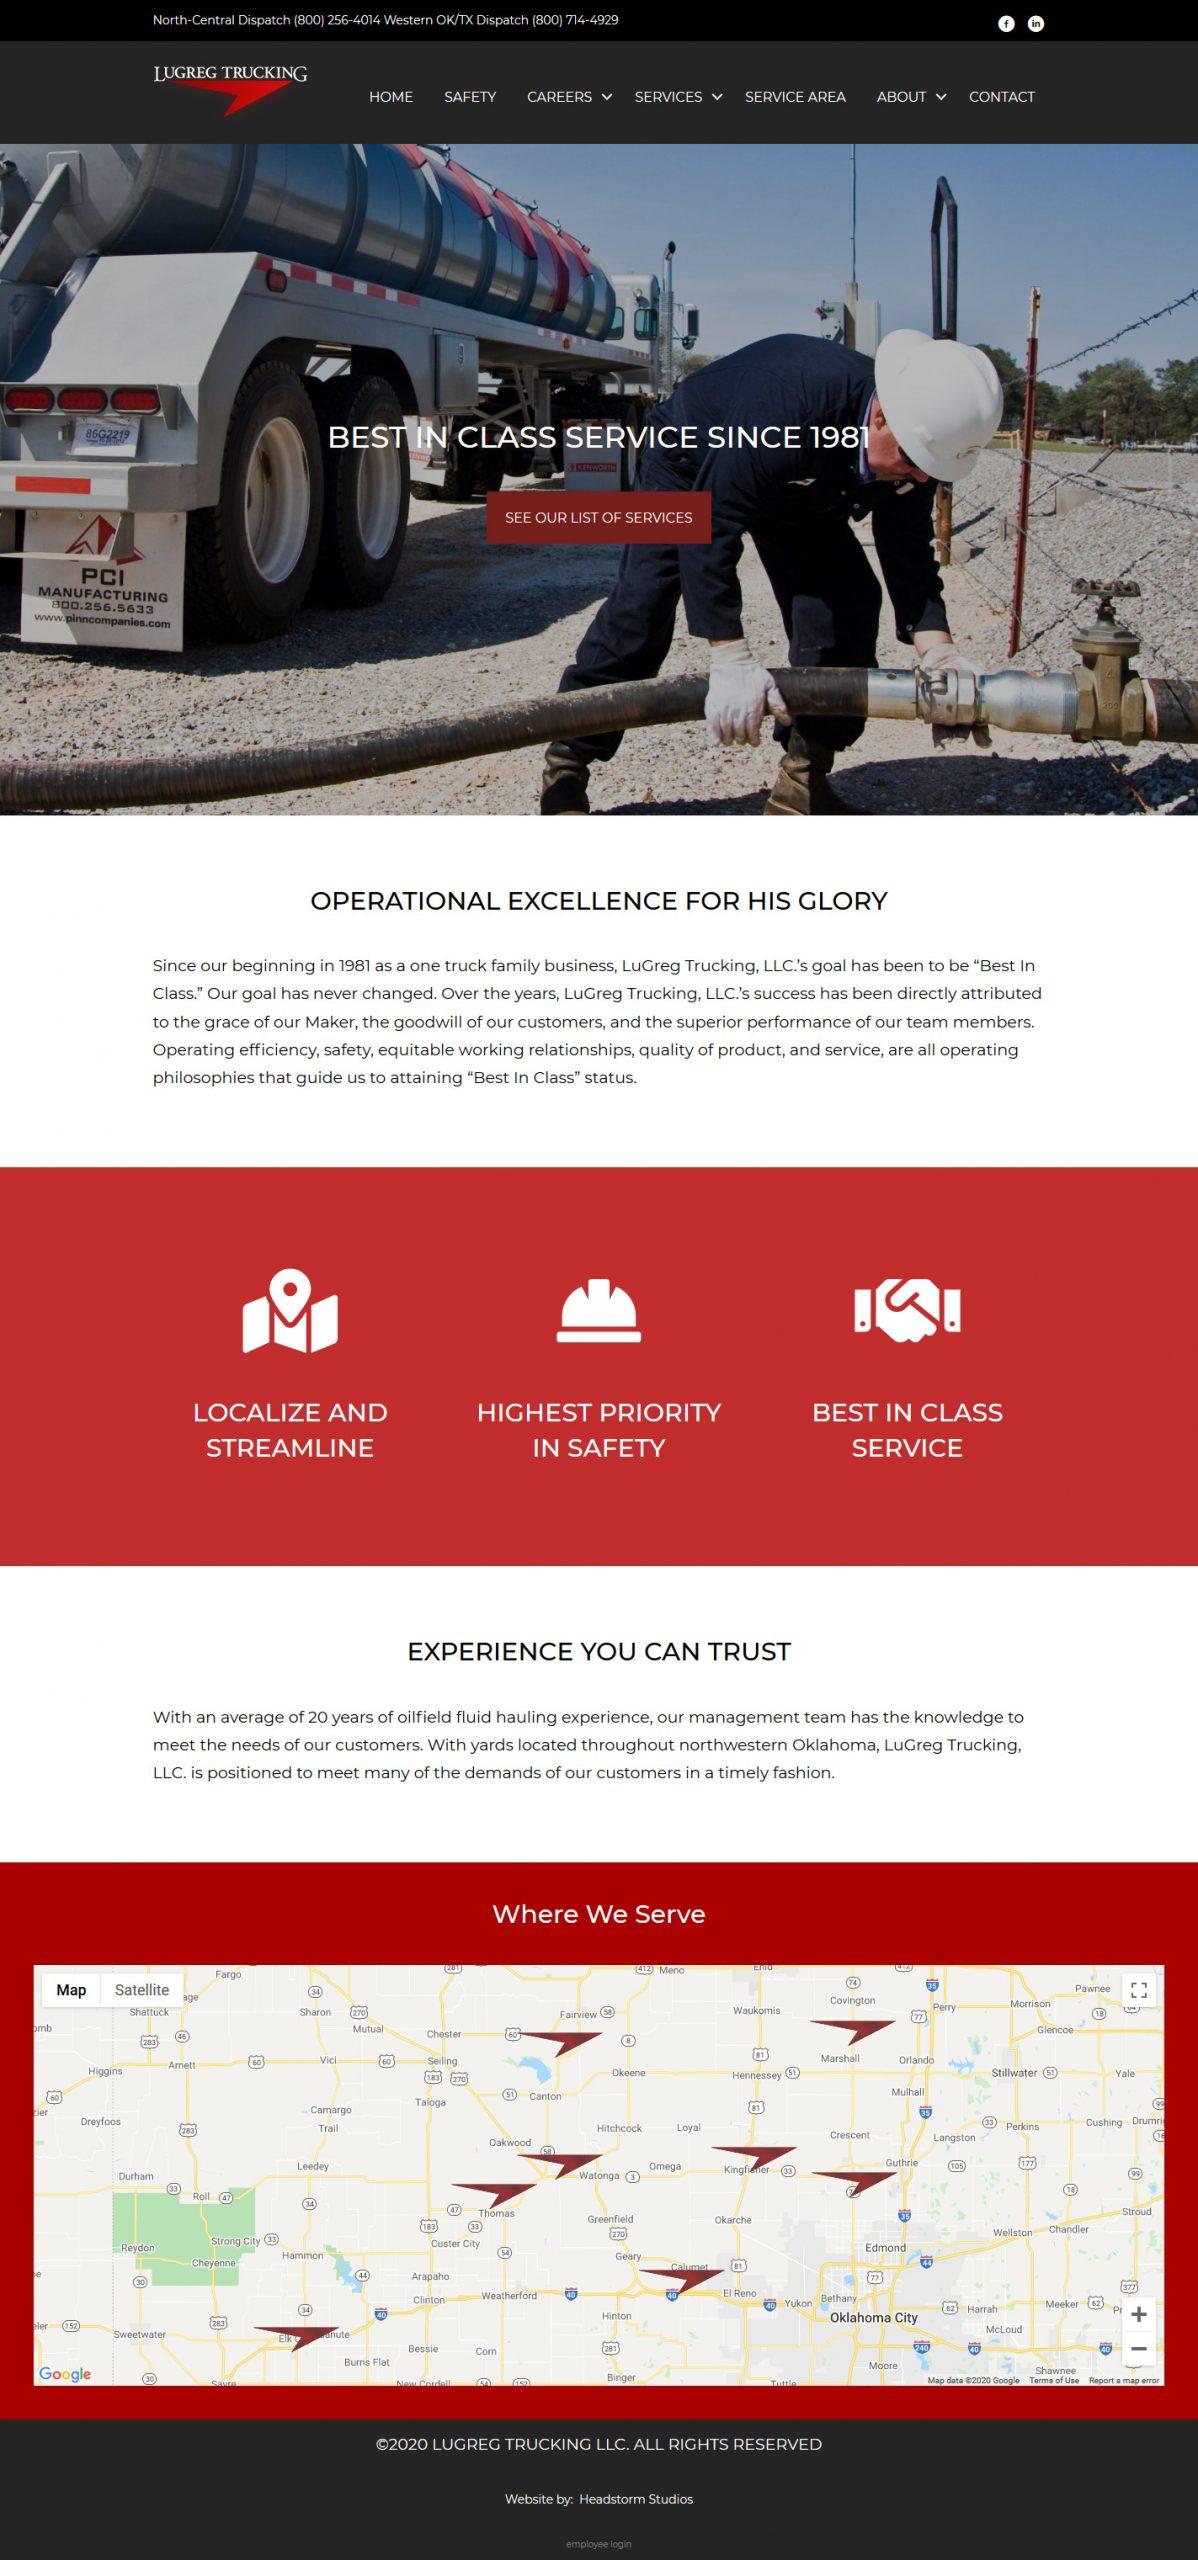 lugreg-trucking-website-design-okc-headstorm-studios